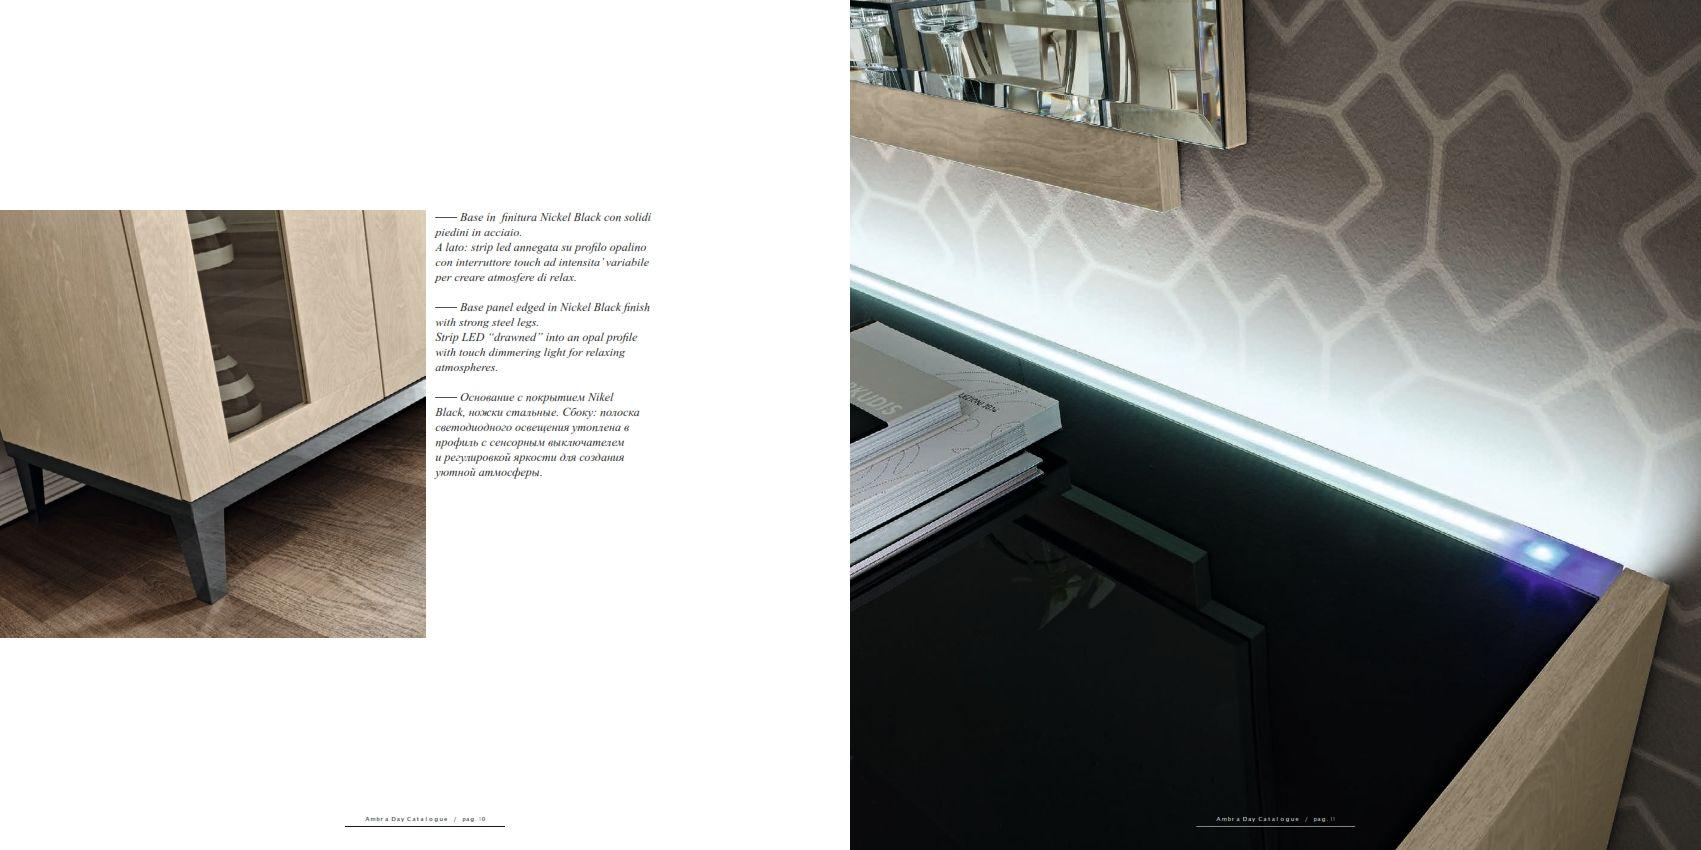 Chaises de salle manger salle manger camelgroup for Chaise de salle a manger trackid sp 006